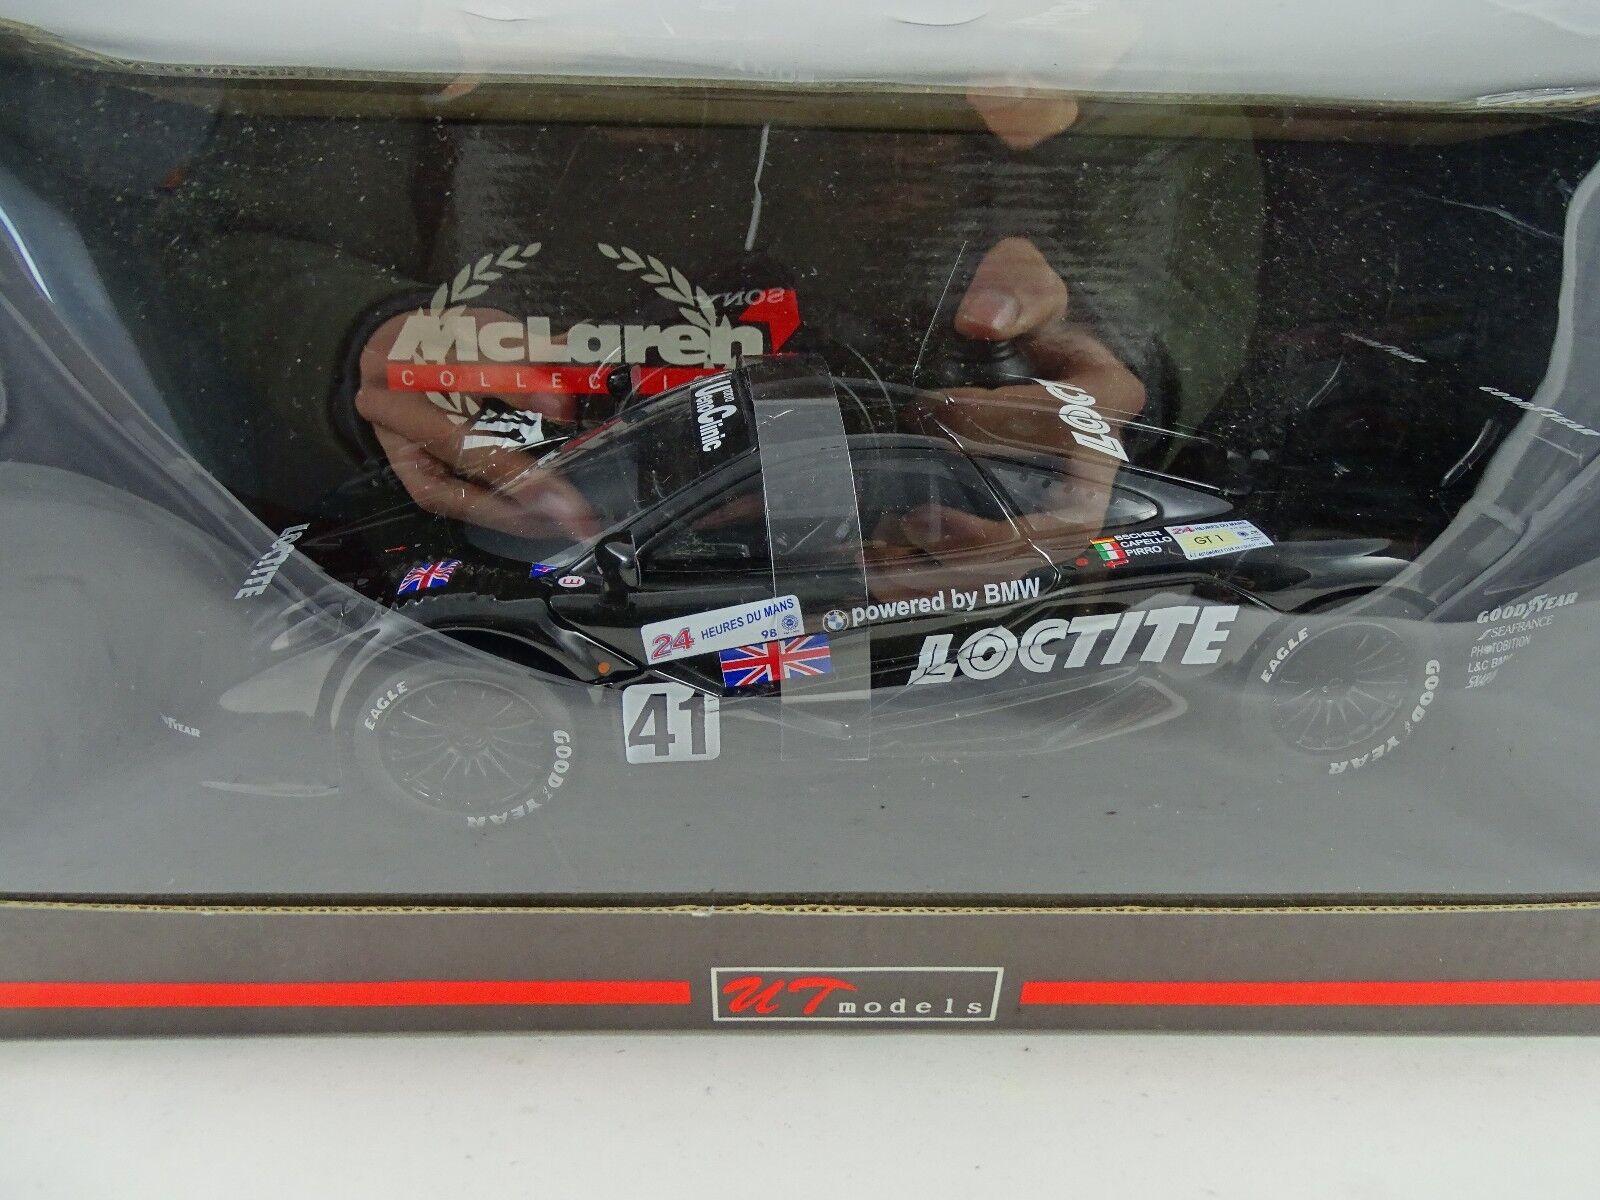 1:18 Autoart  Ut 39821 Mclaren F1 GTR Le Mans Loctite 41 2018 - Rareza Nuevo